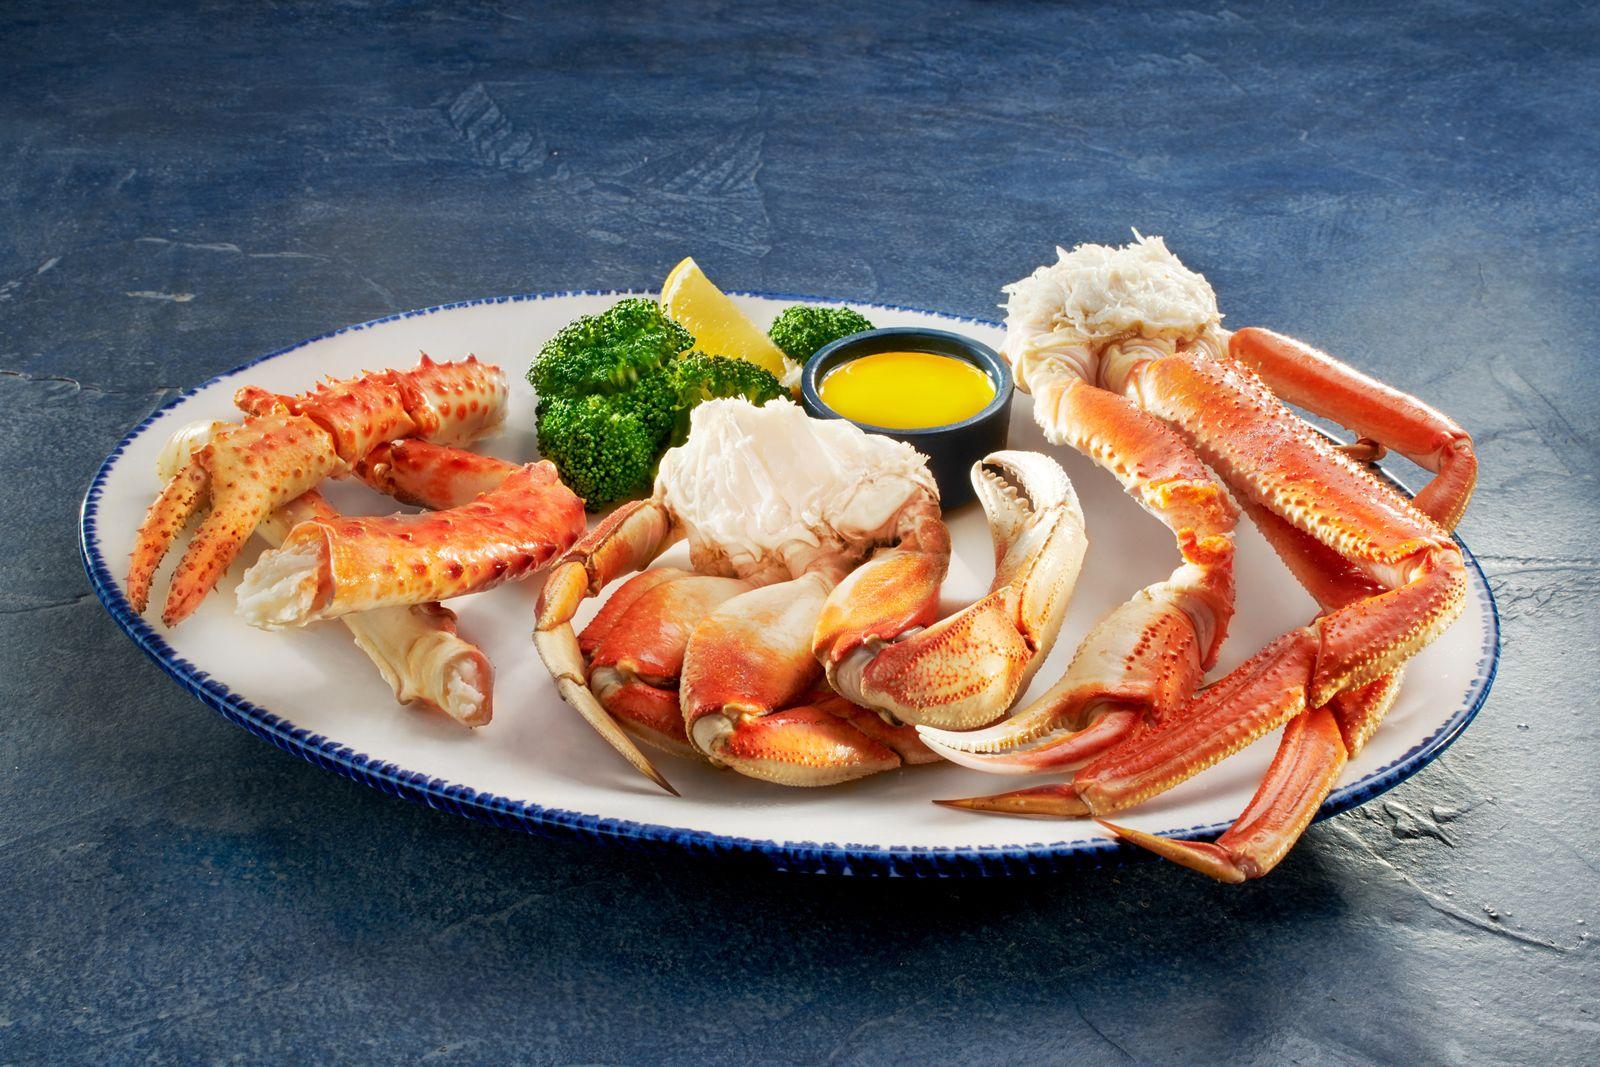 Bairdi Crab is Back at Red Lobster for Crabfest